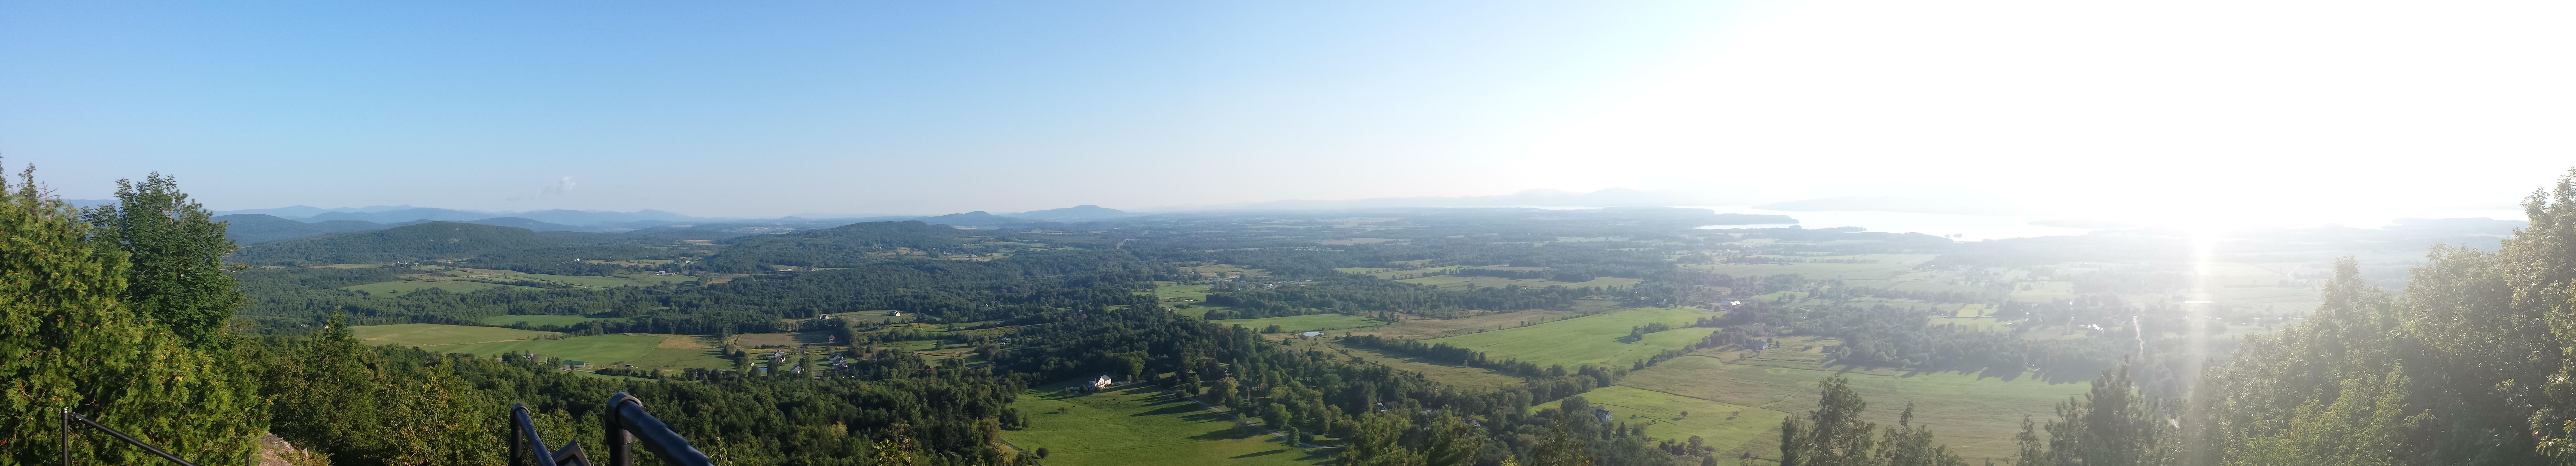 Mount Philo State Park